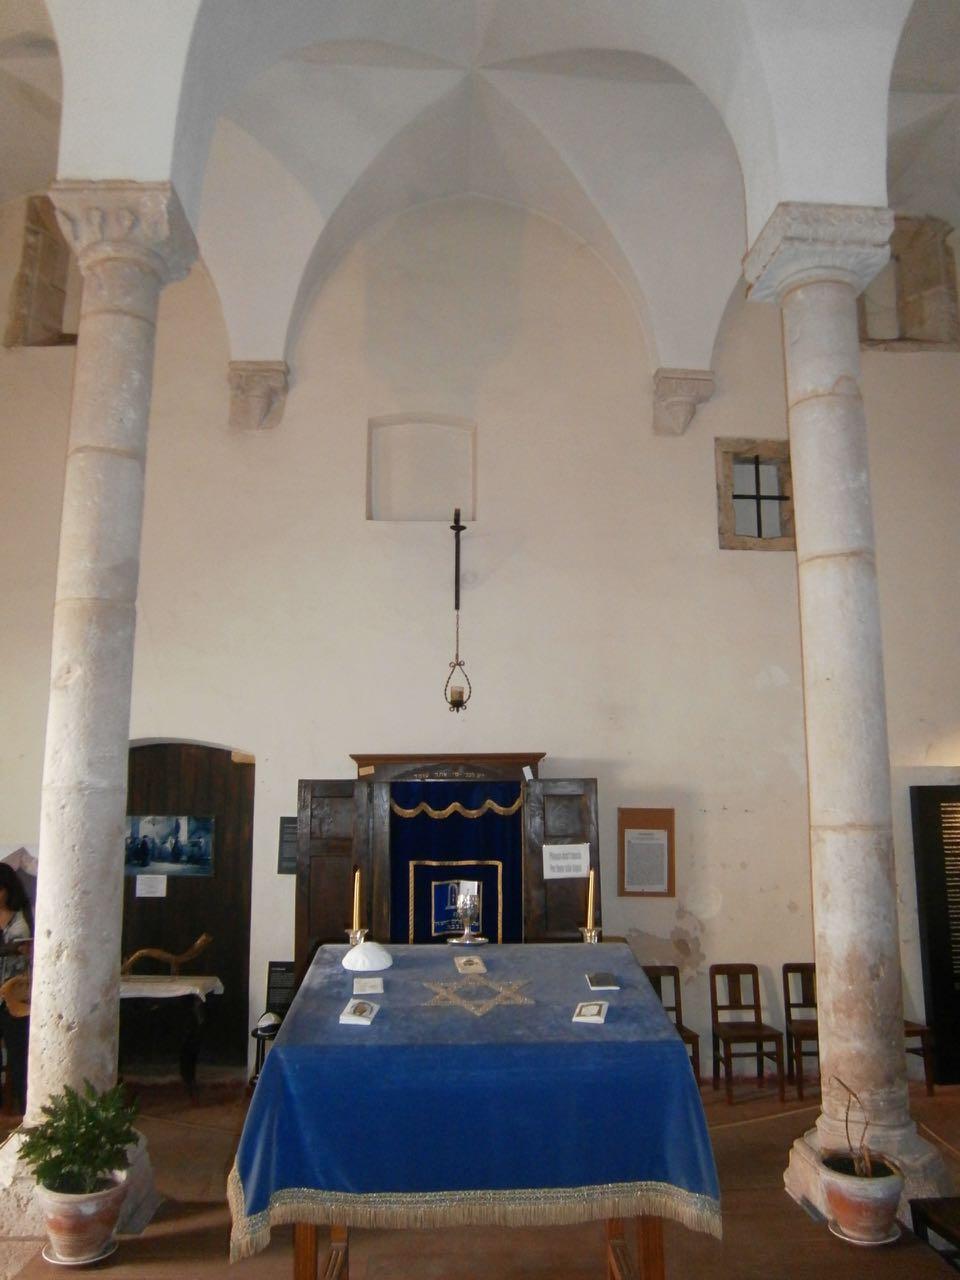 Sepharad Jewish site heritage building temple